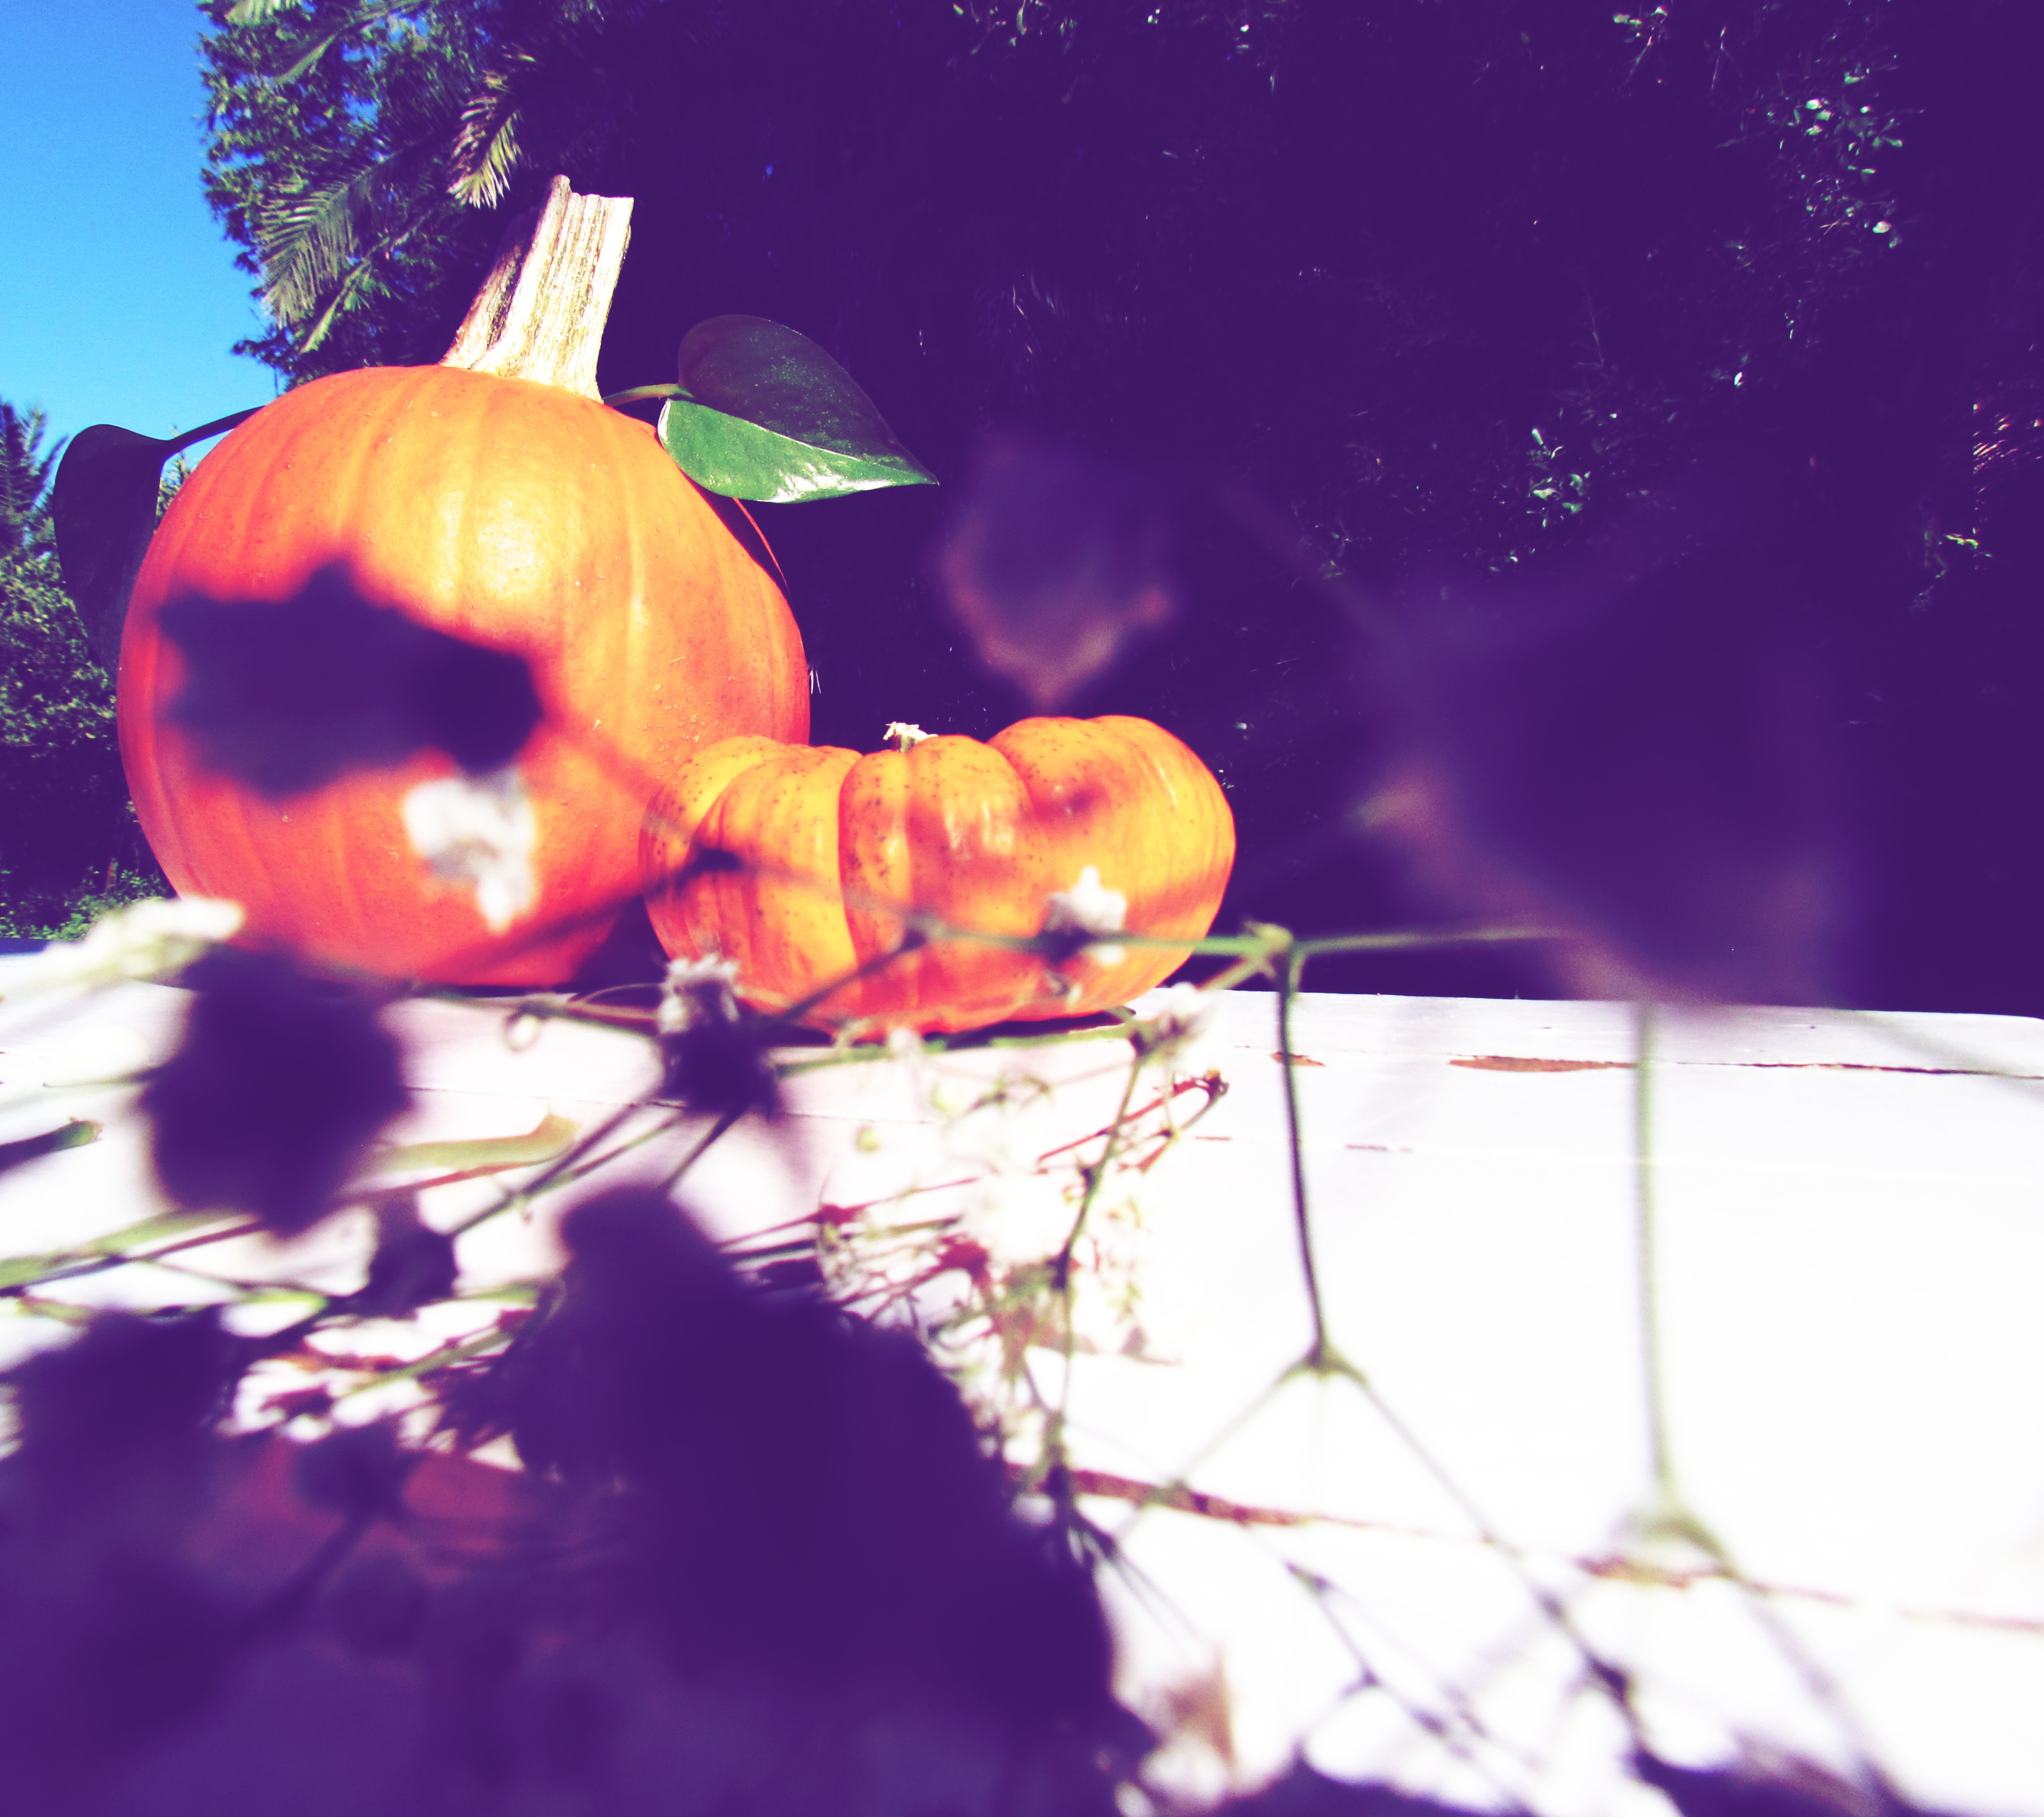 Pumpkin display table, pumpkins for sale, fall foliage, shabby chic table, farmhouse style table